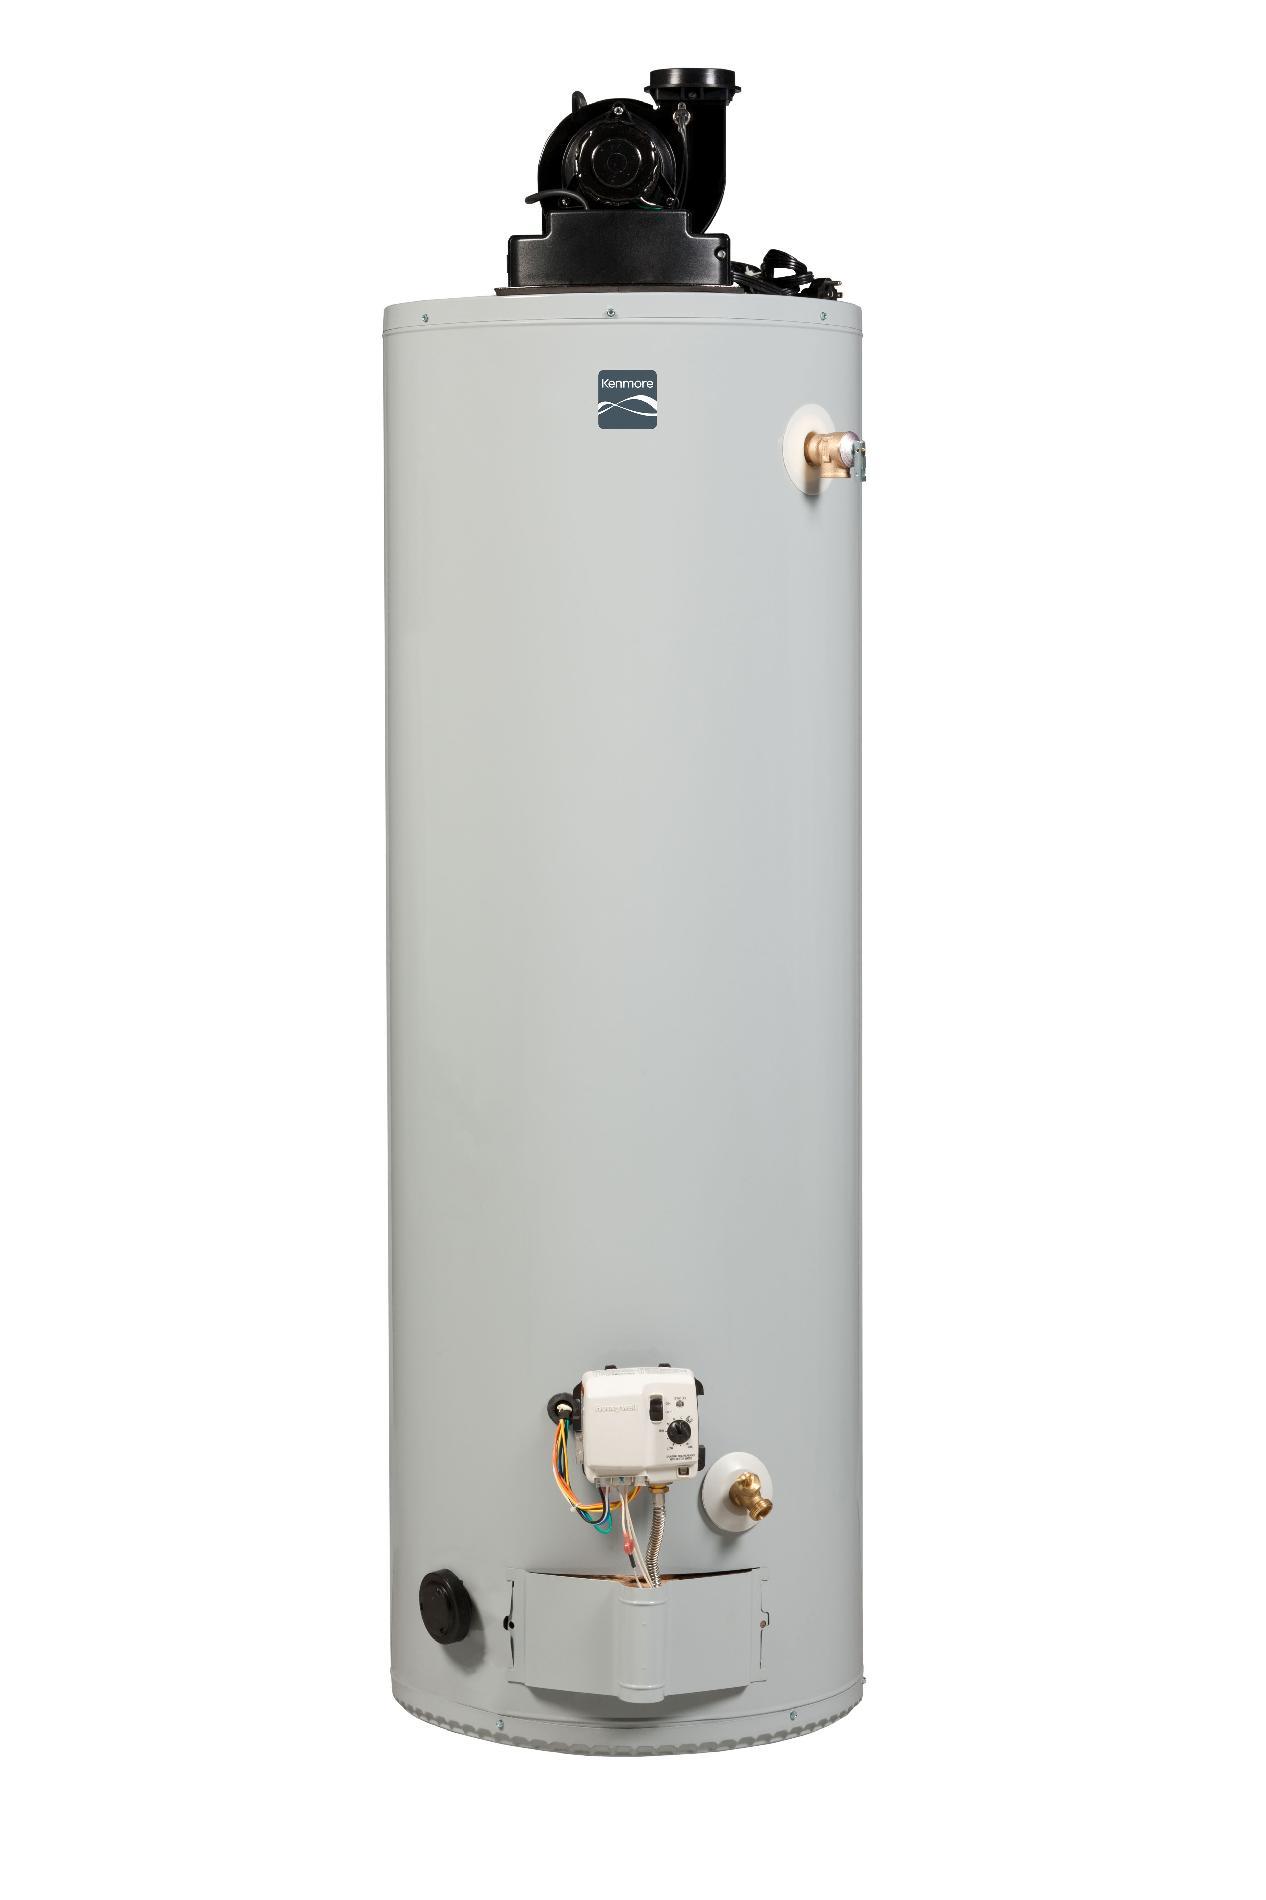 medium resolution of spin prod 869229412 hei 333 wid 333 op sharpen 1 kenmore 33136 50 gal gas power vent water heater wiring diagram